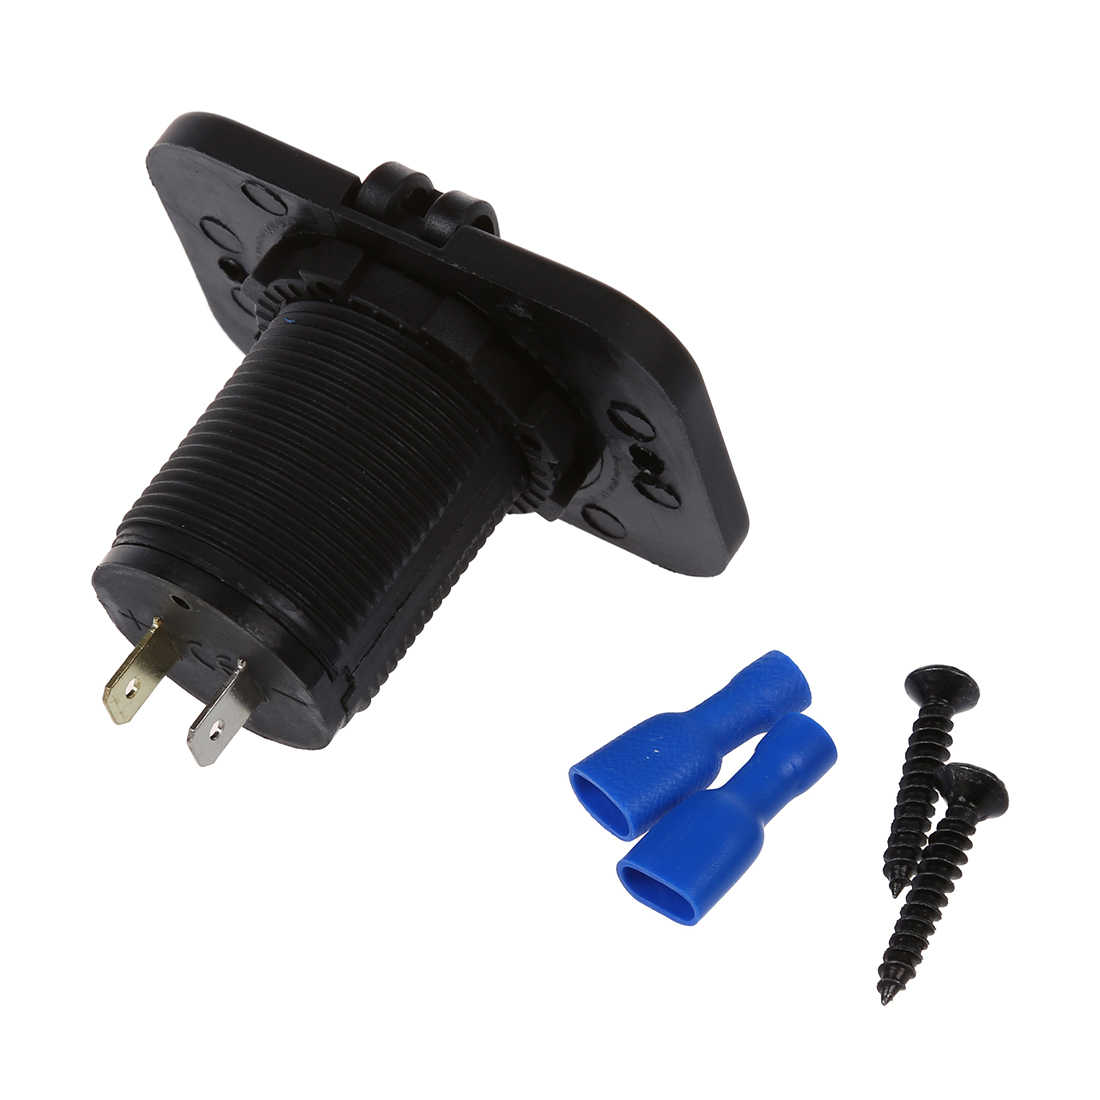 1 Set Adapter Socket 2 USB Ports Car Charger For 12V Car Auto